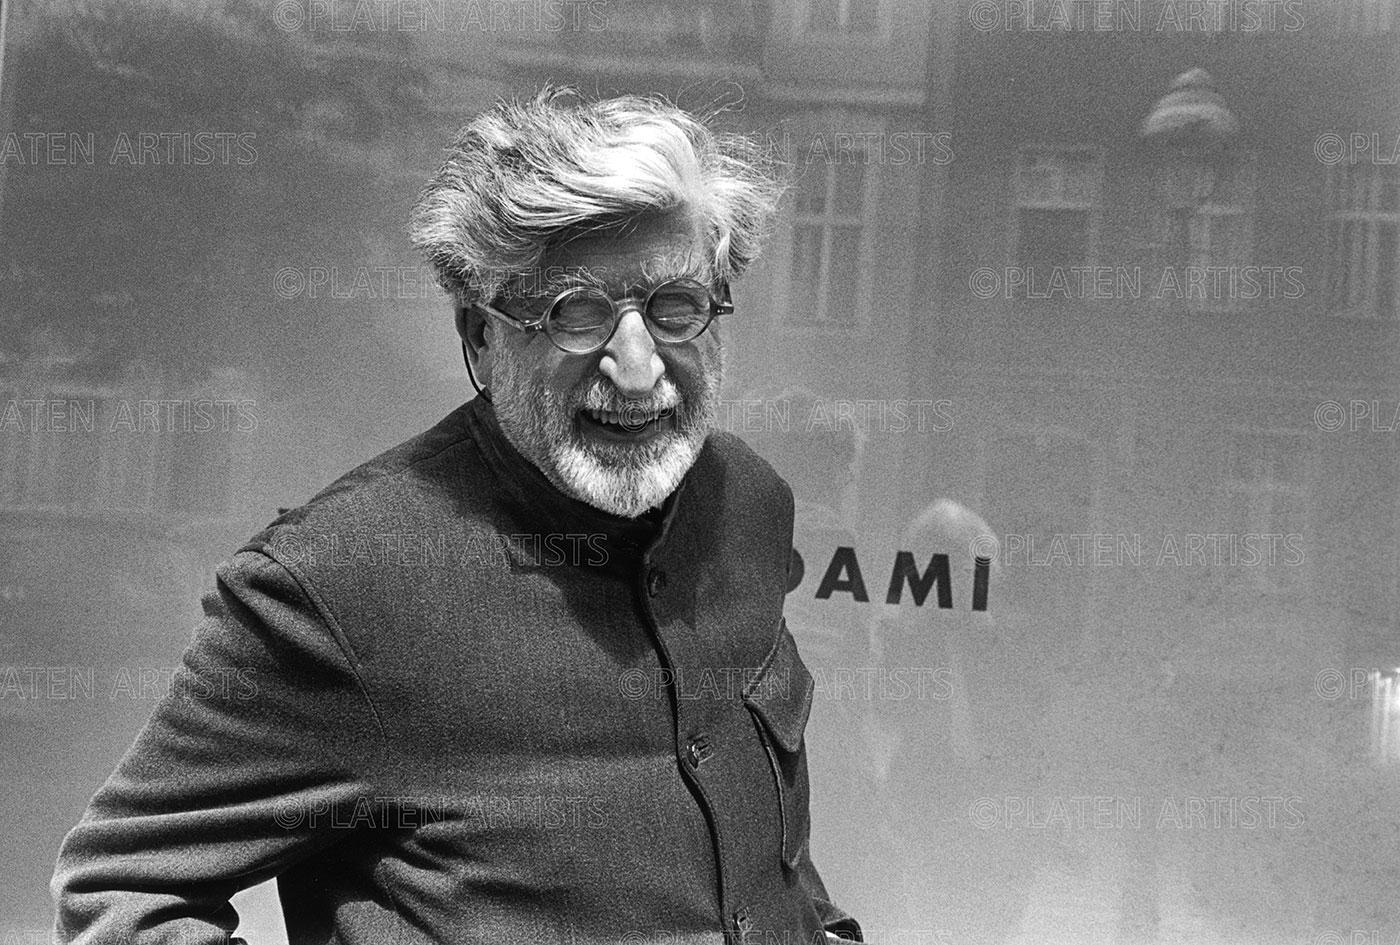 Valerio Adami, AMI in Berlin, Berlin, 2008